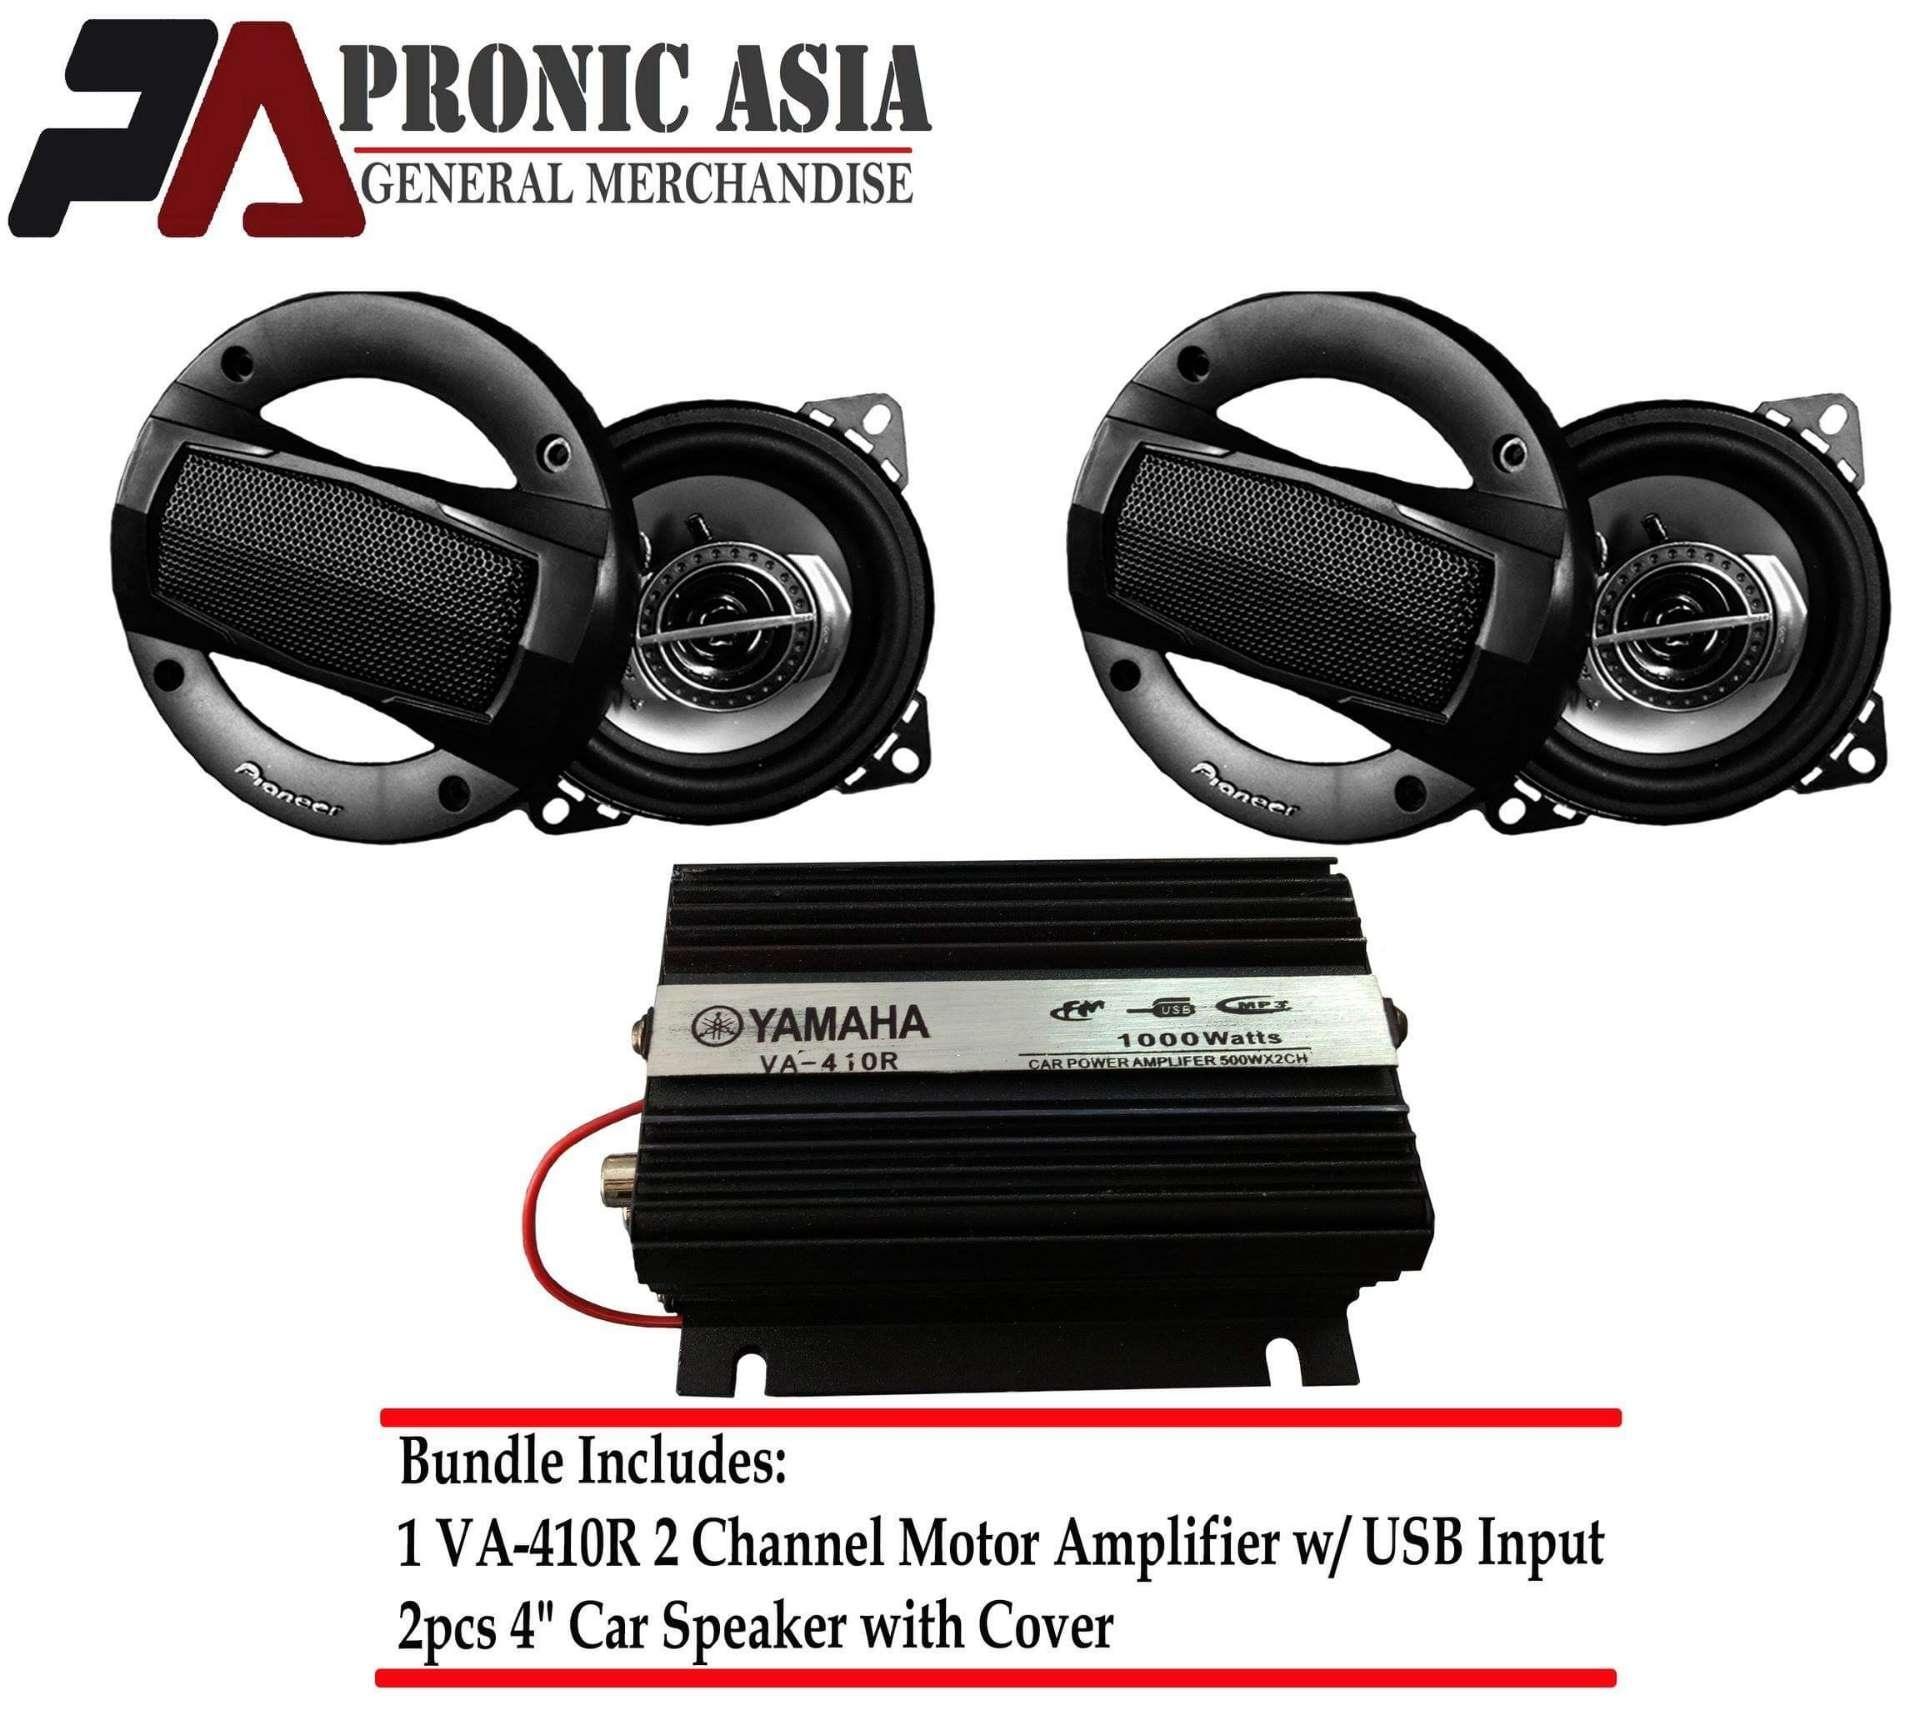 Bundle 13 PROMO: VA-410R Motor Amplifier w/ Radio & USB Input + 2pcs 4